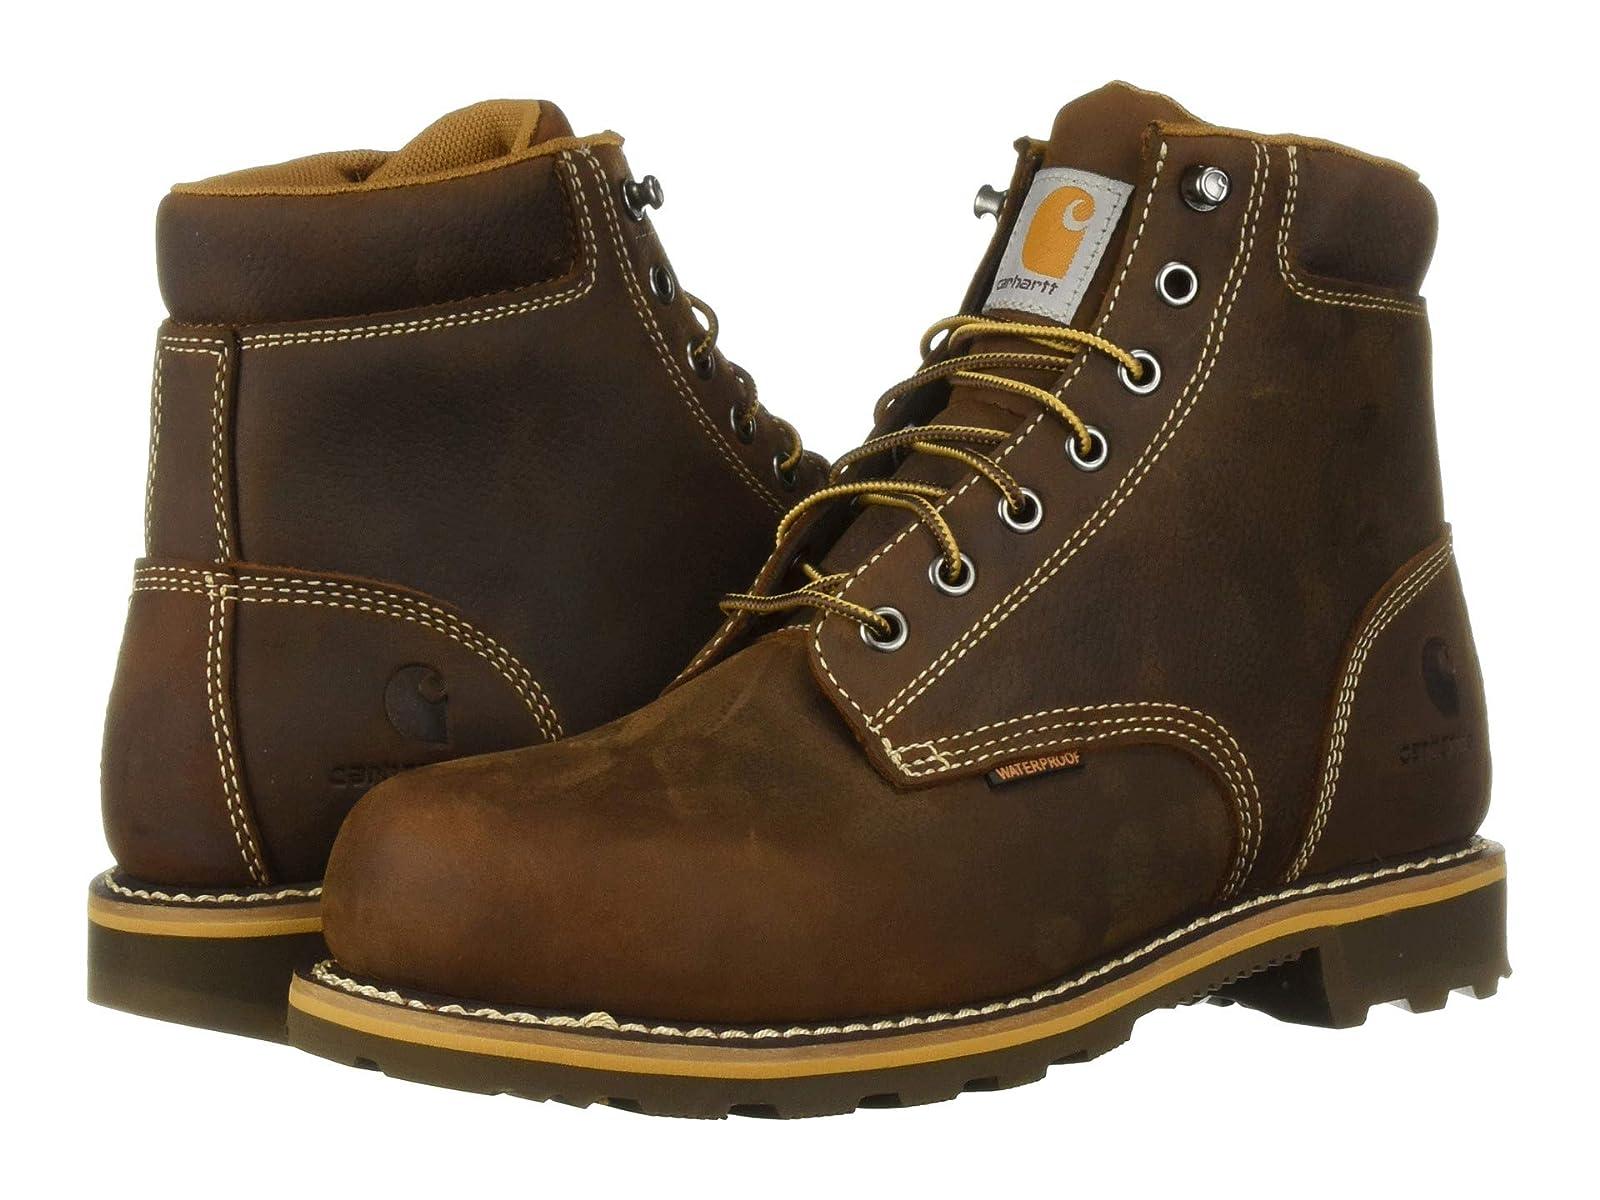 "Carhartt 6"" Toe Plain Toe Lug Soft Toe 6"" a2679d"